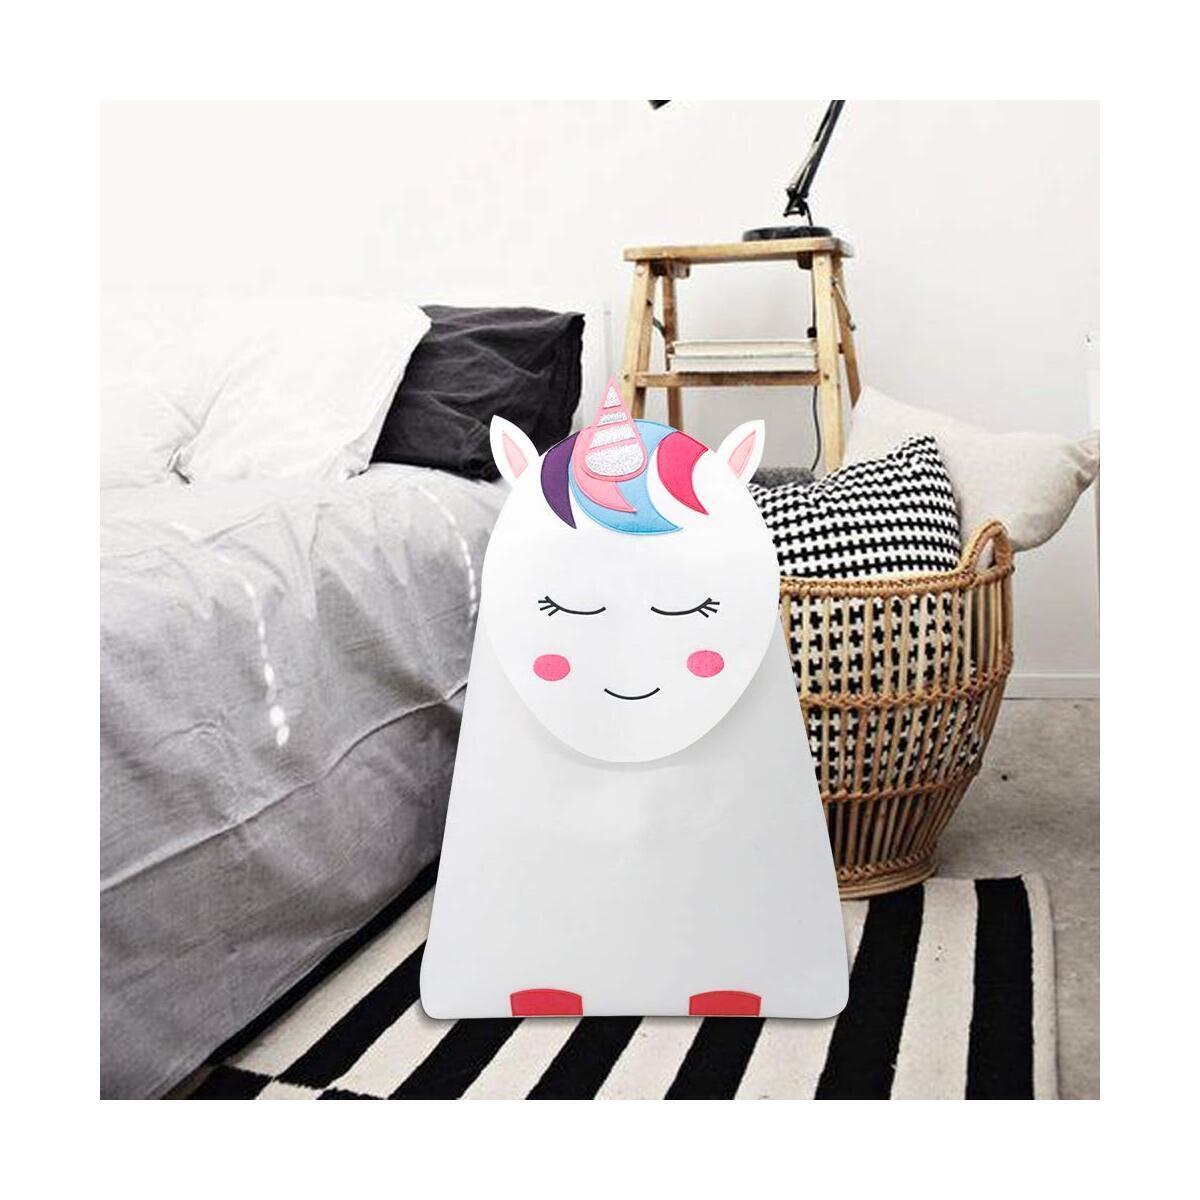 Bings & Things Unicorn Laundry Basket Hamper for Kids